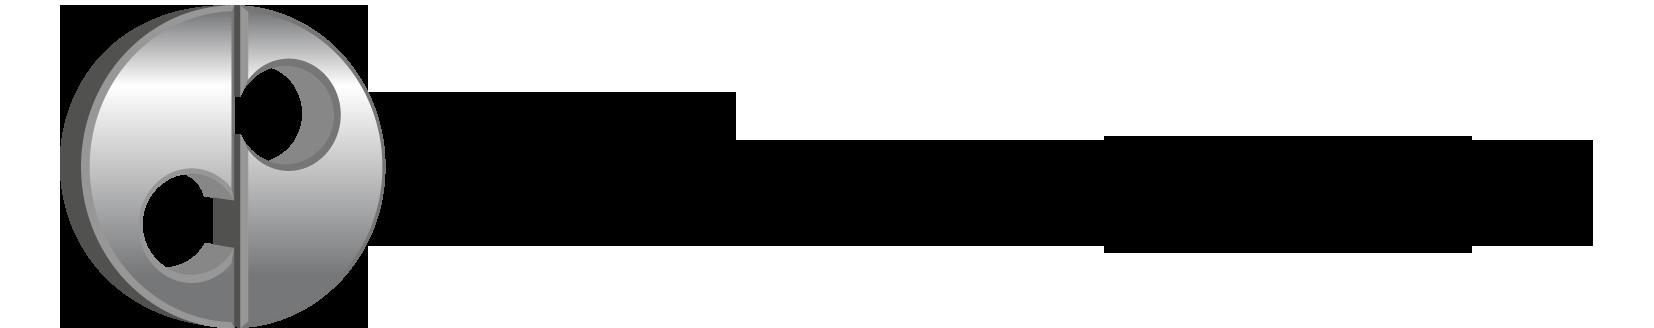 DIS-TRAN Steel logo